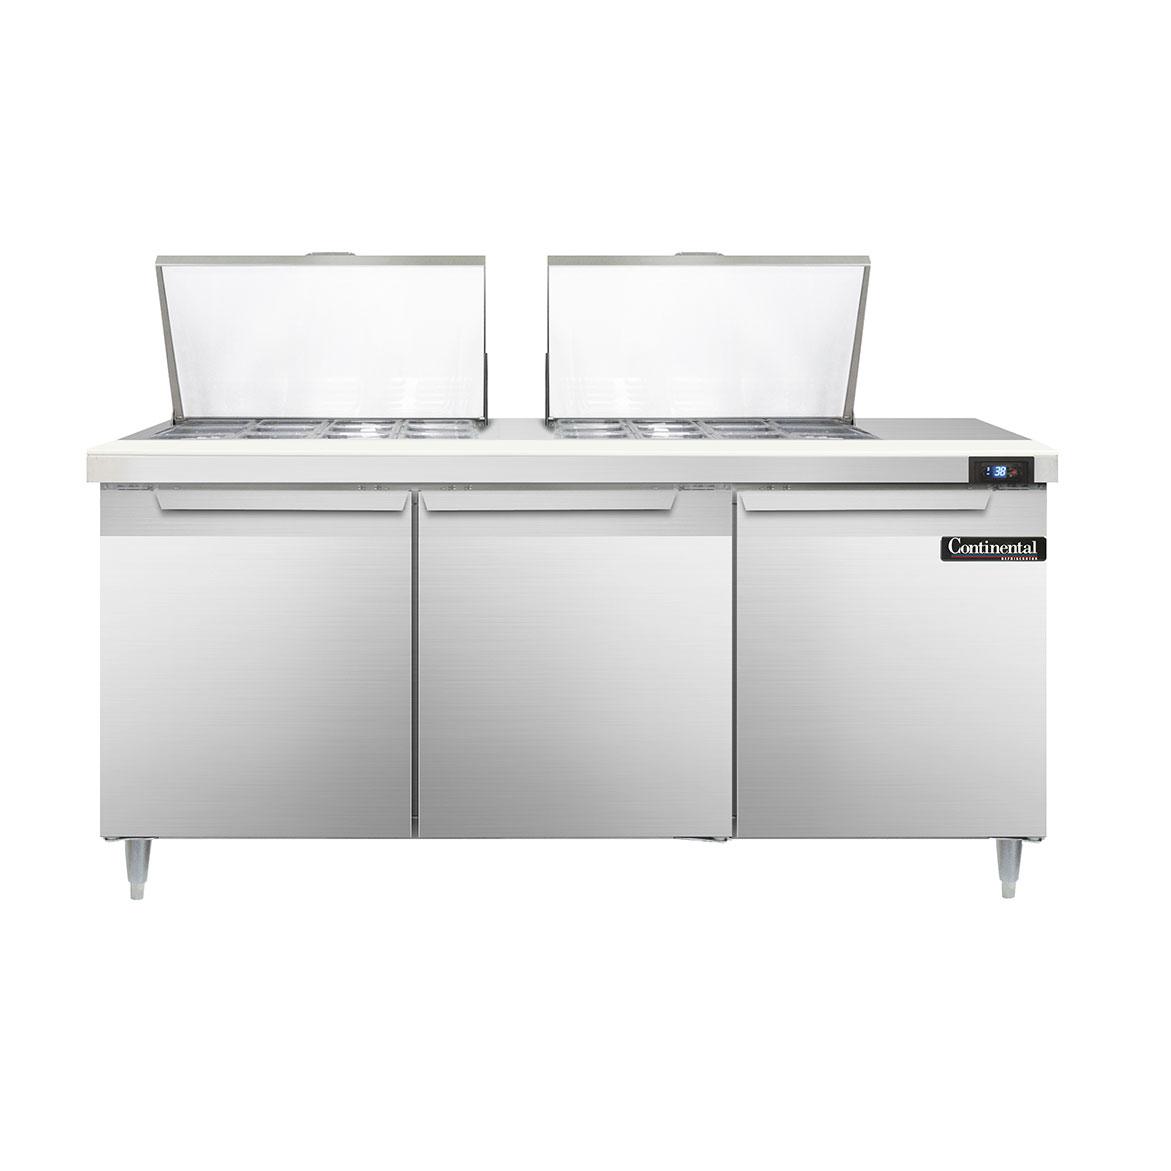 Continental Refrigerator DL72-24M refrigerated counter, mega top sandwich / salad unit